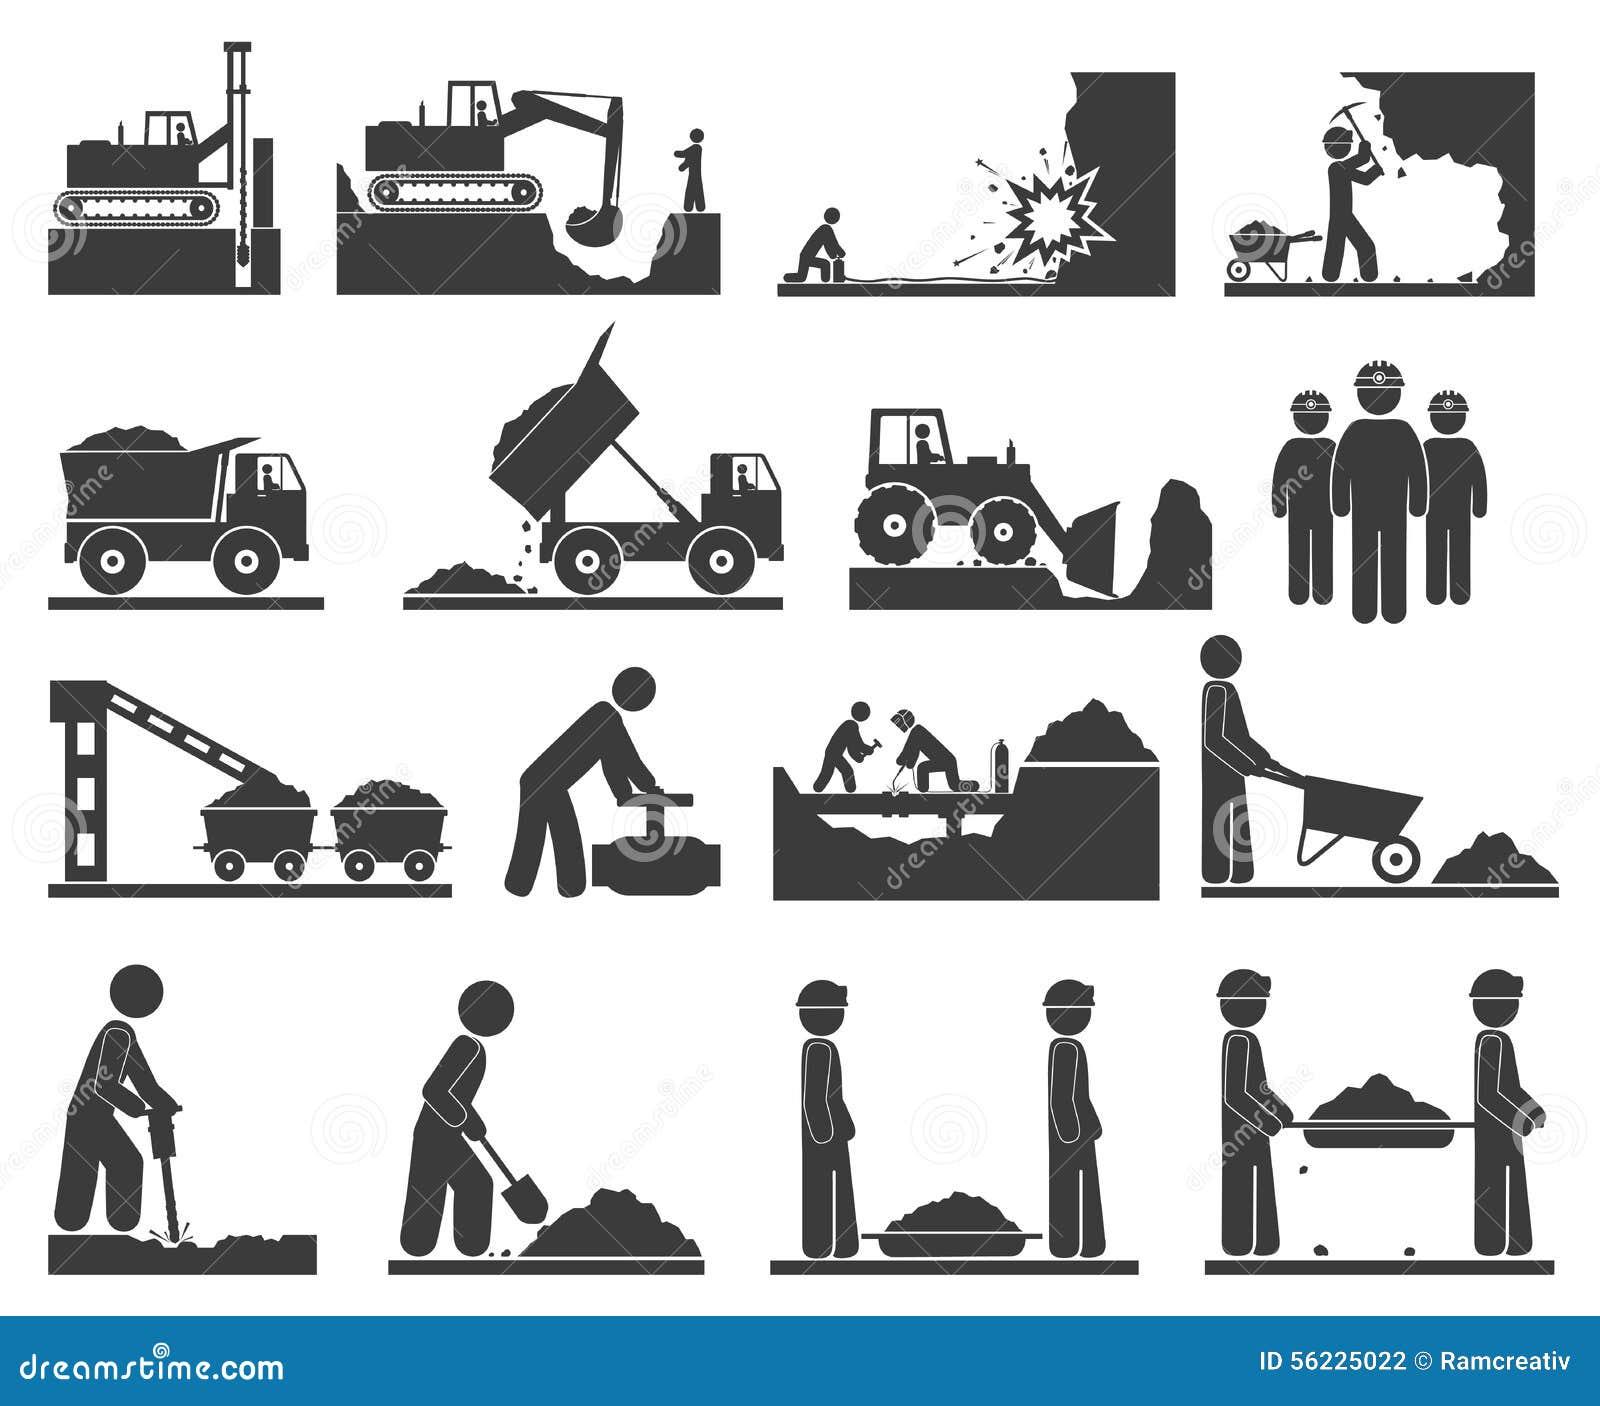 u0421onstruction earthworks icons mining and quarrying coal backhoe clip art silhouette backhoe clip art clip art